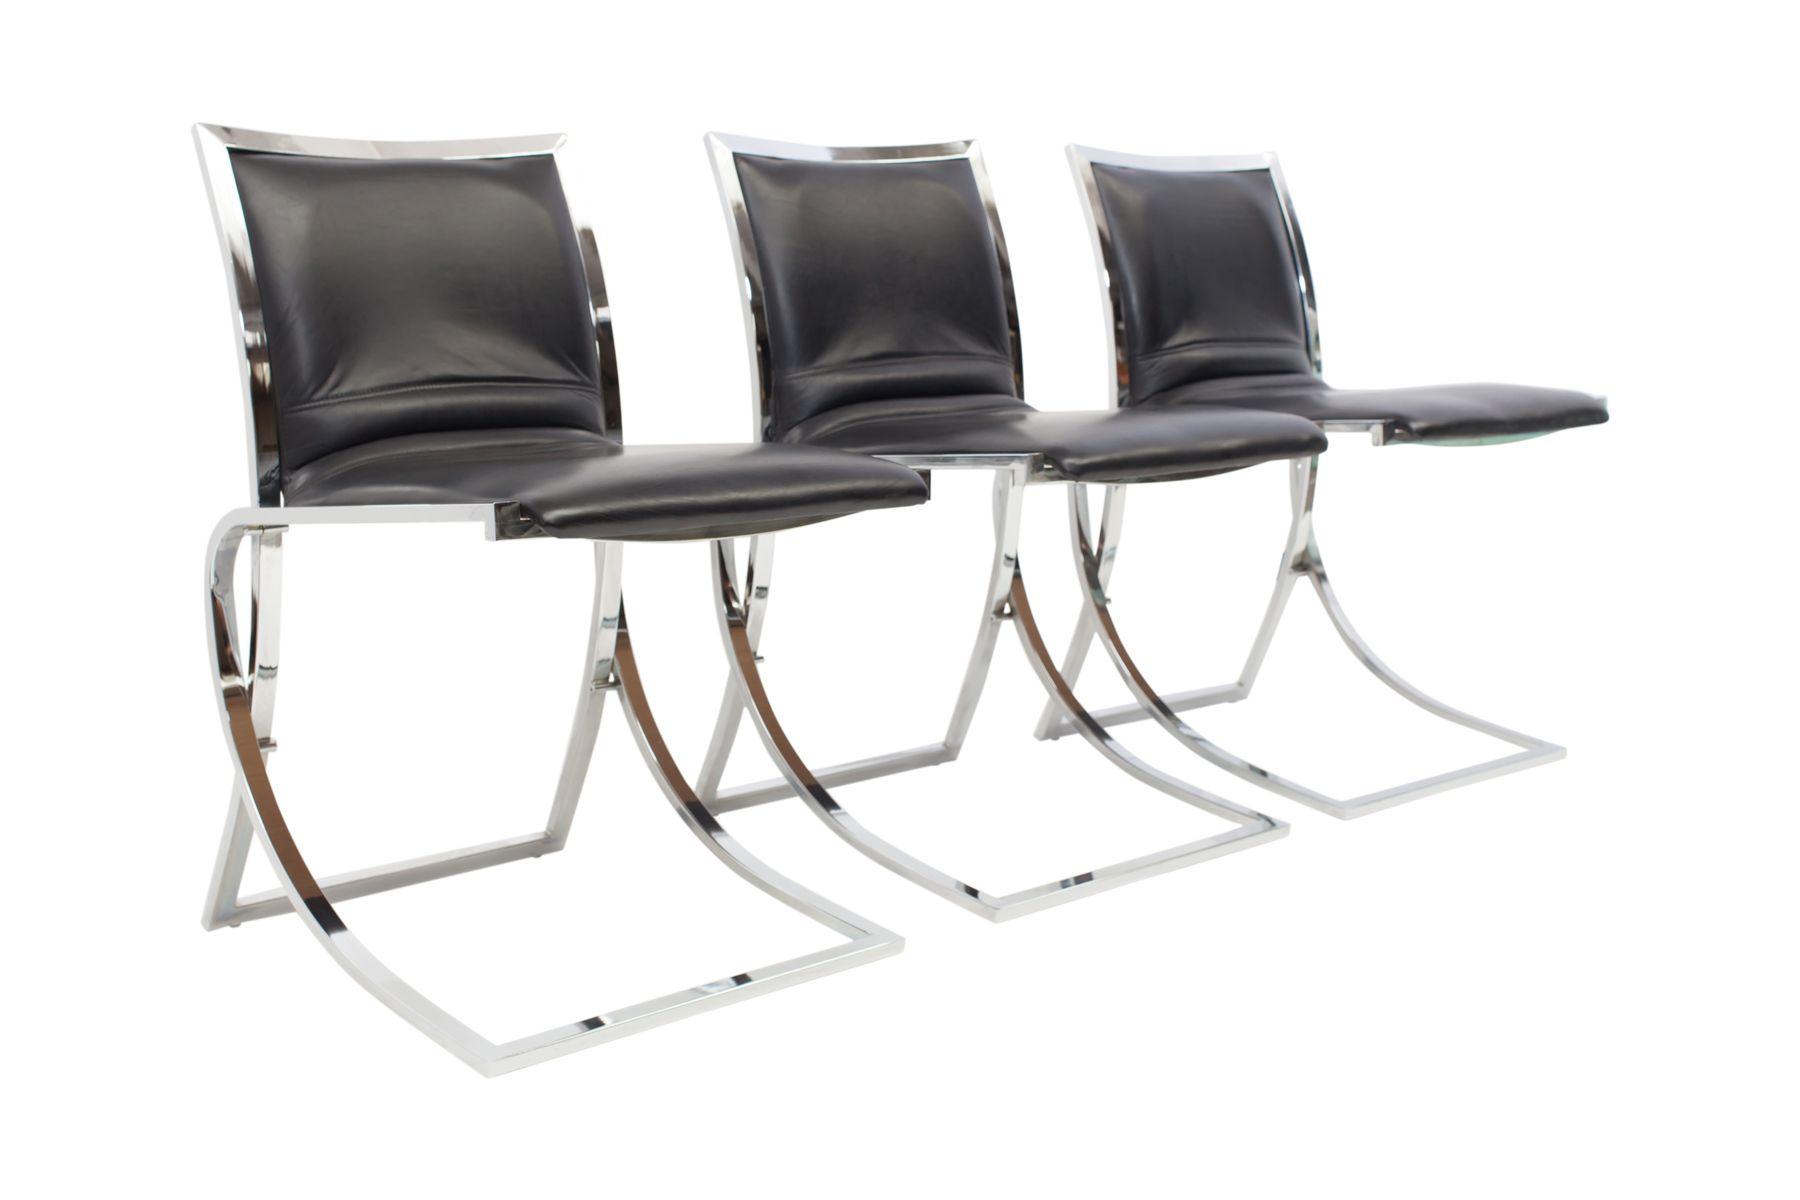 esszimmerst hle von maison jansen 1970er 6er set bei. Black Bedroom Furniture Sets. Home Design Ideas